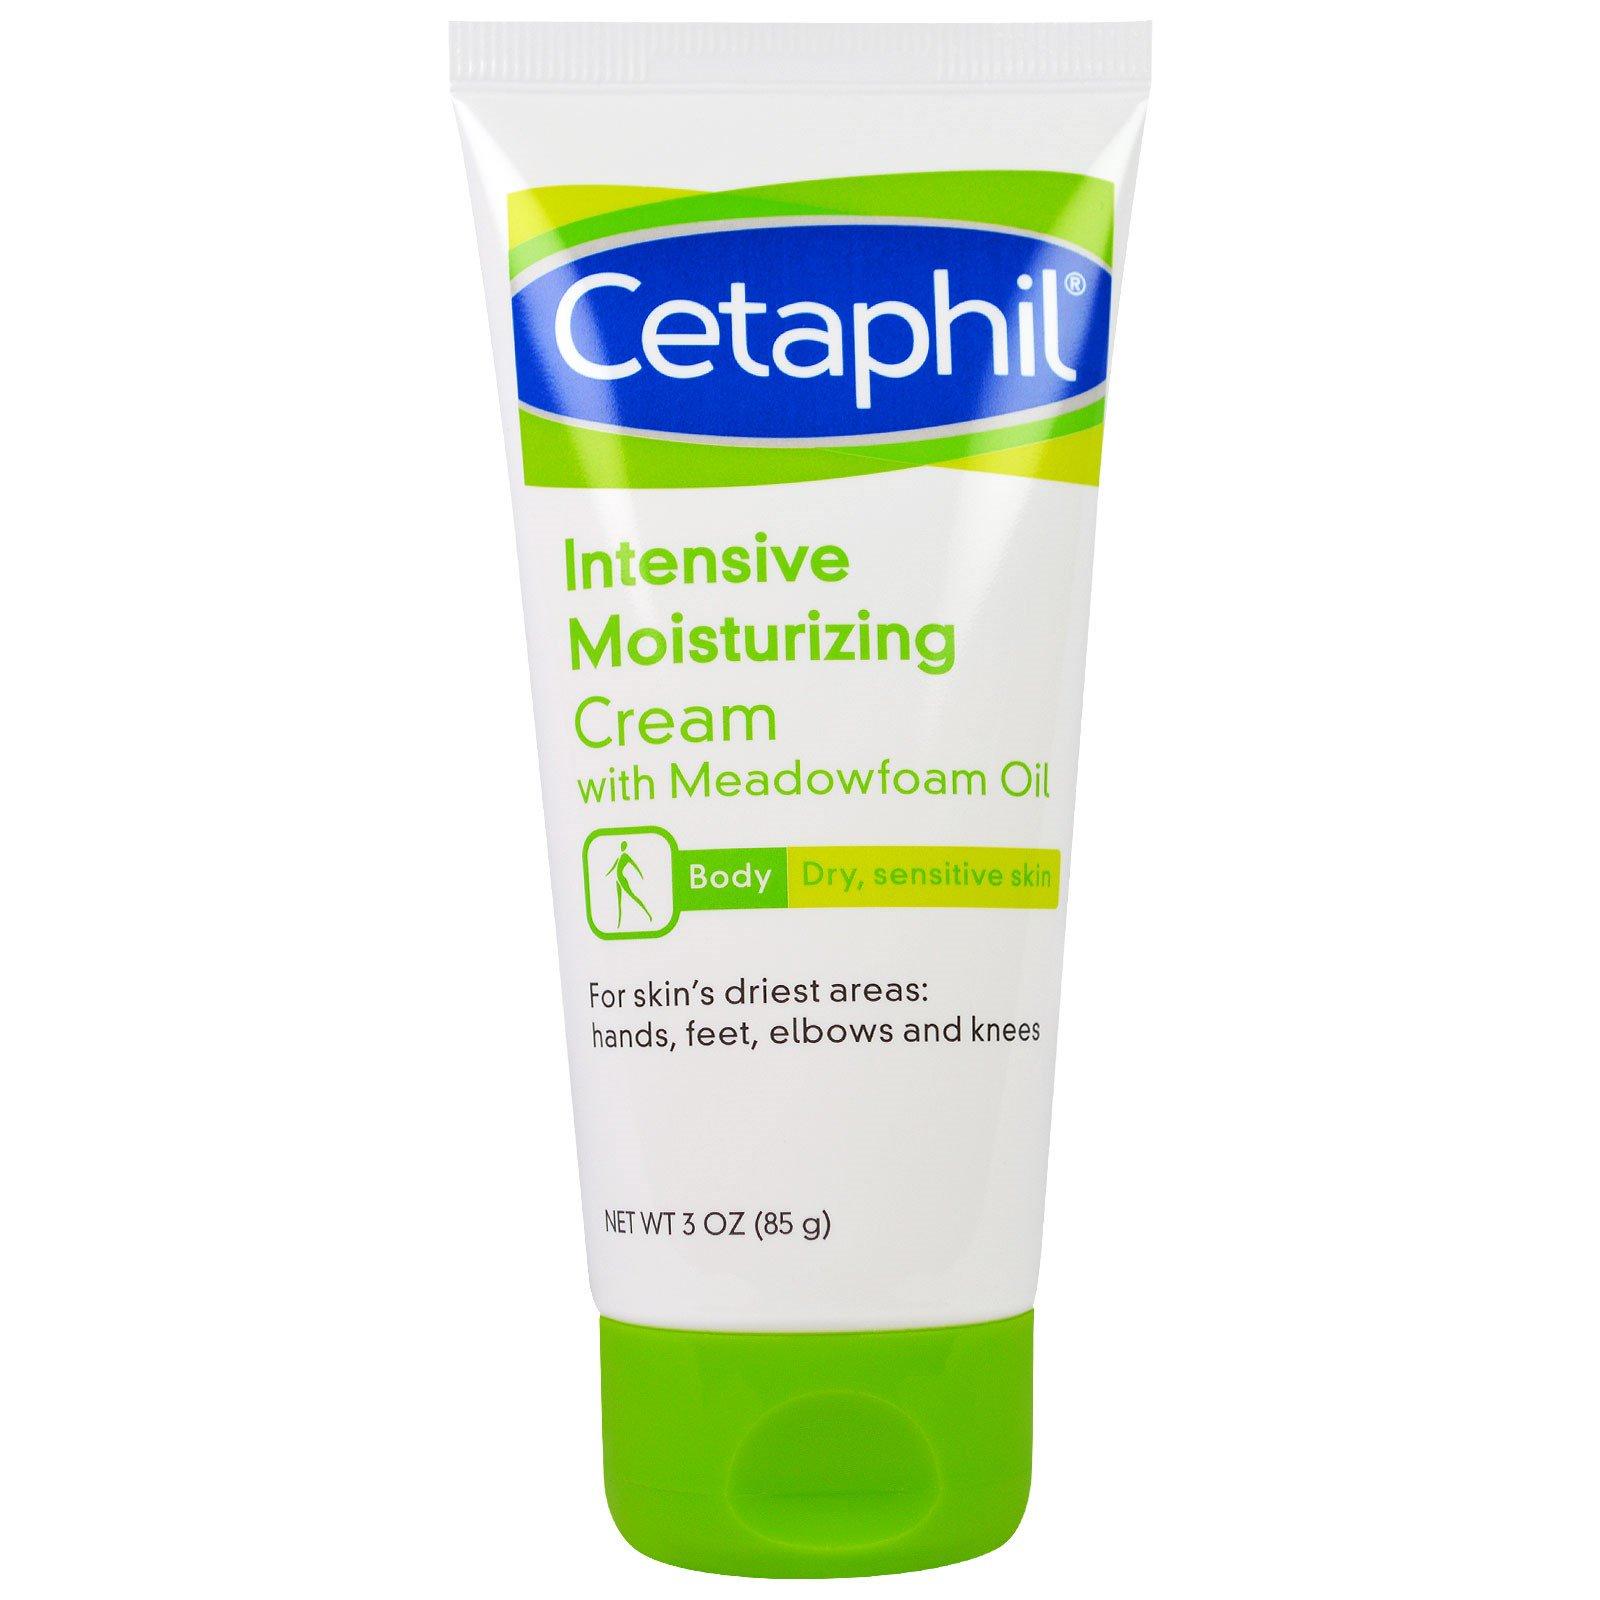 cetaphil intensive moisturizing cream review